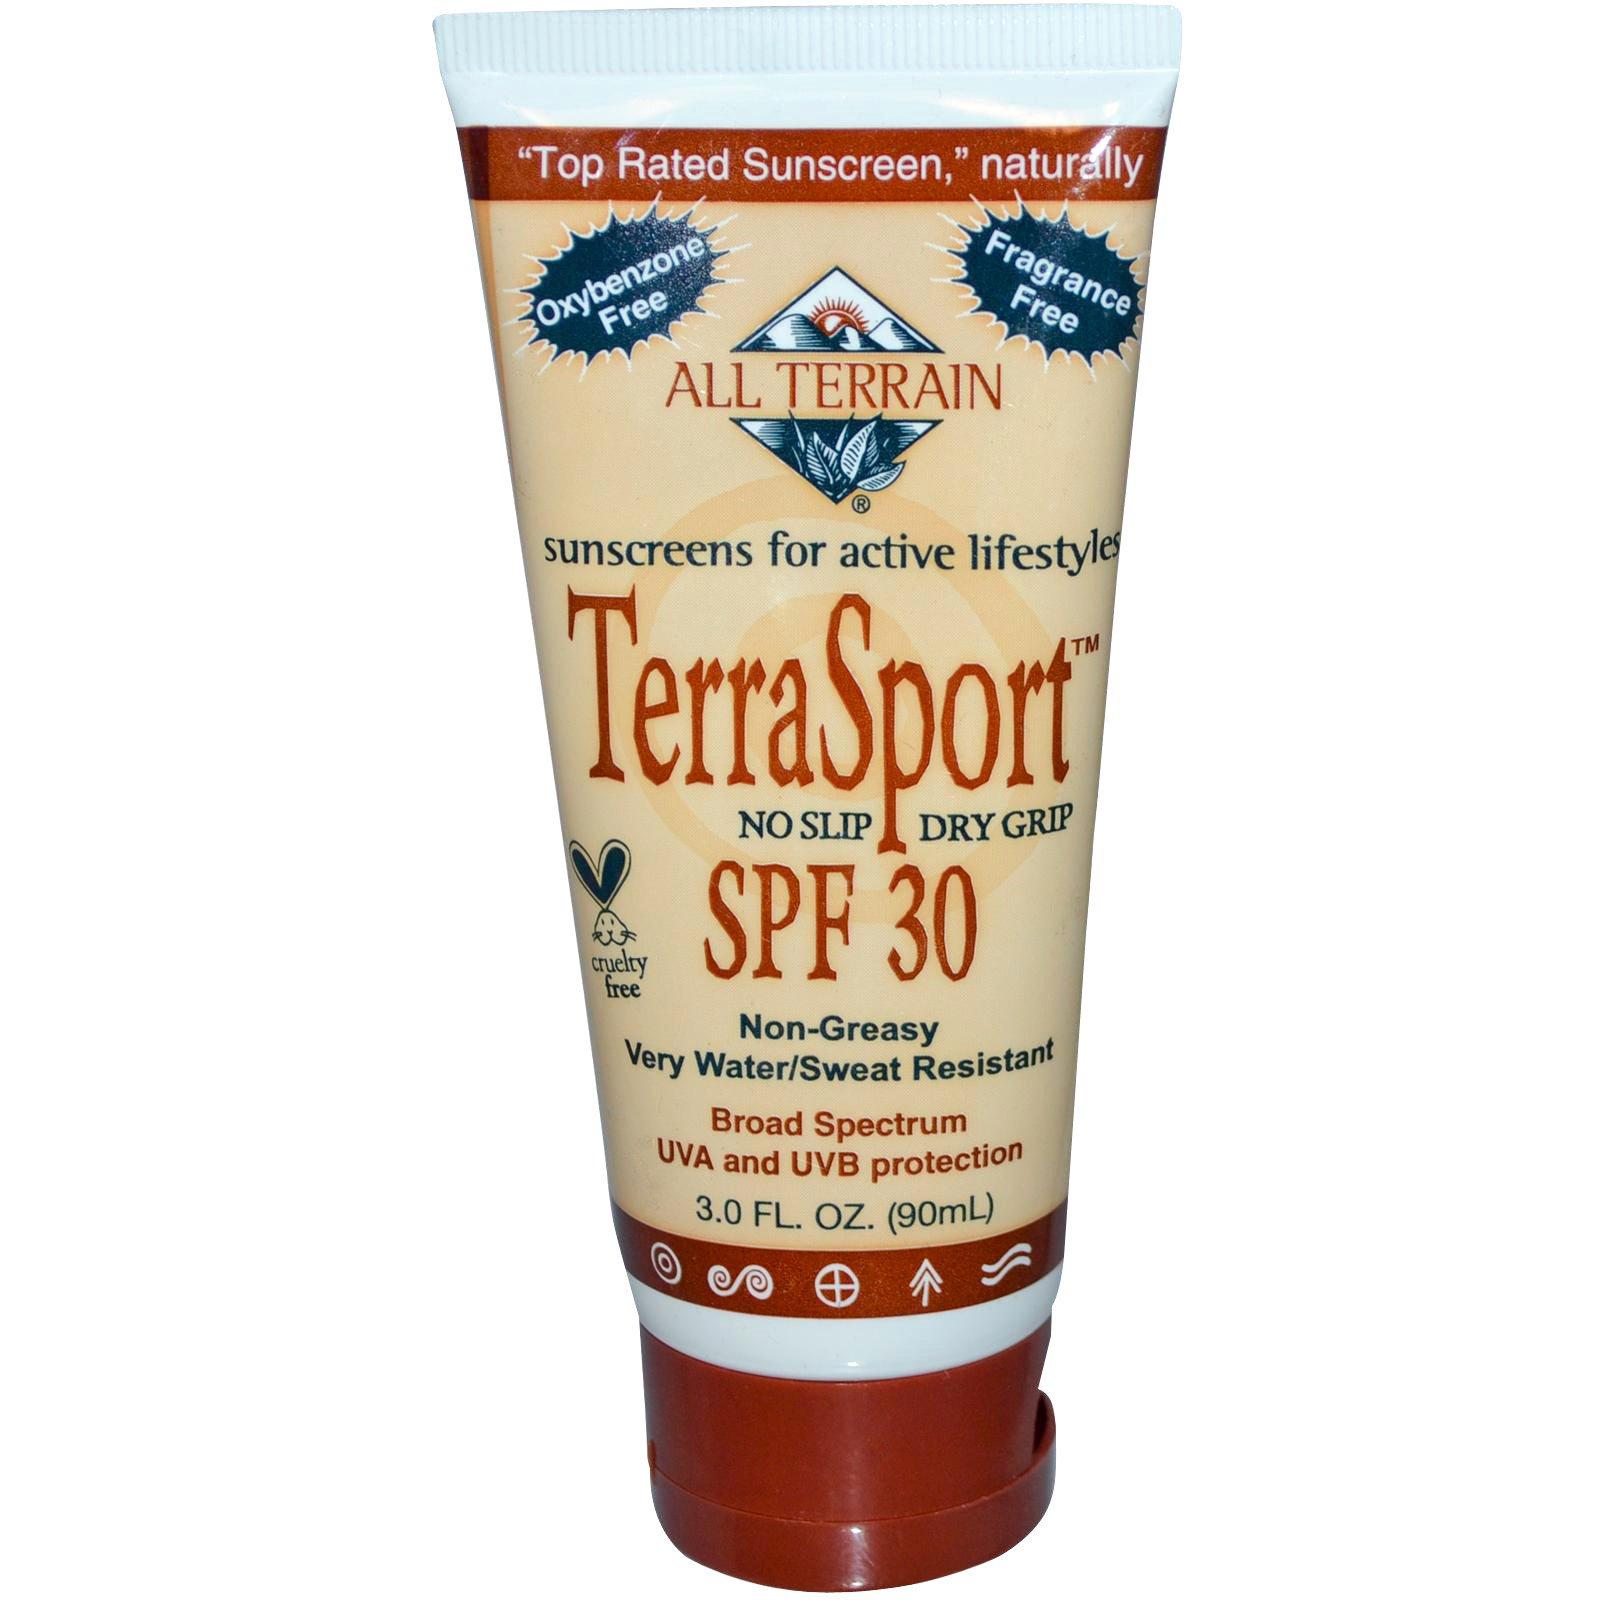 All Terrain, Солнцезащитный крем «ТерраСпорт», SPF 30, без запаха, 3,0 жидких унции (90 мл)